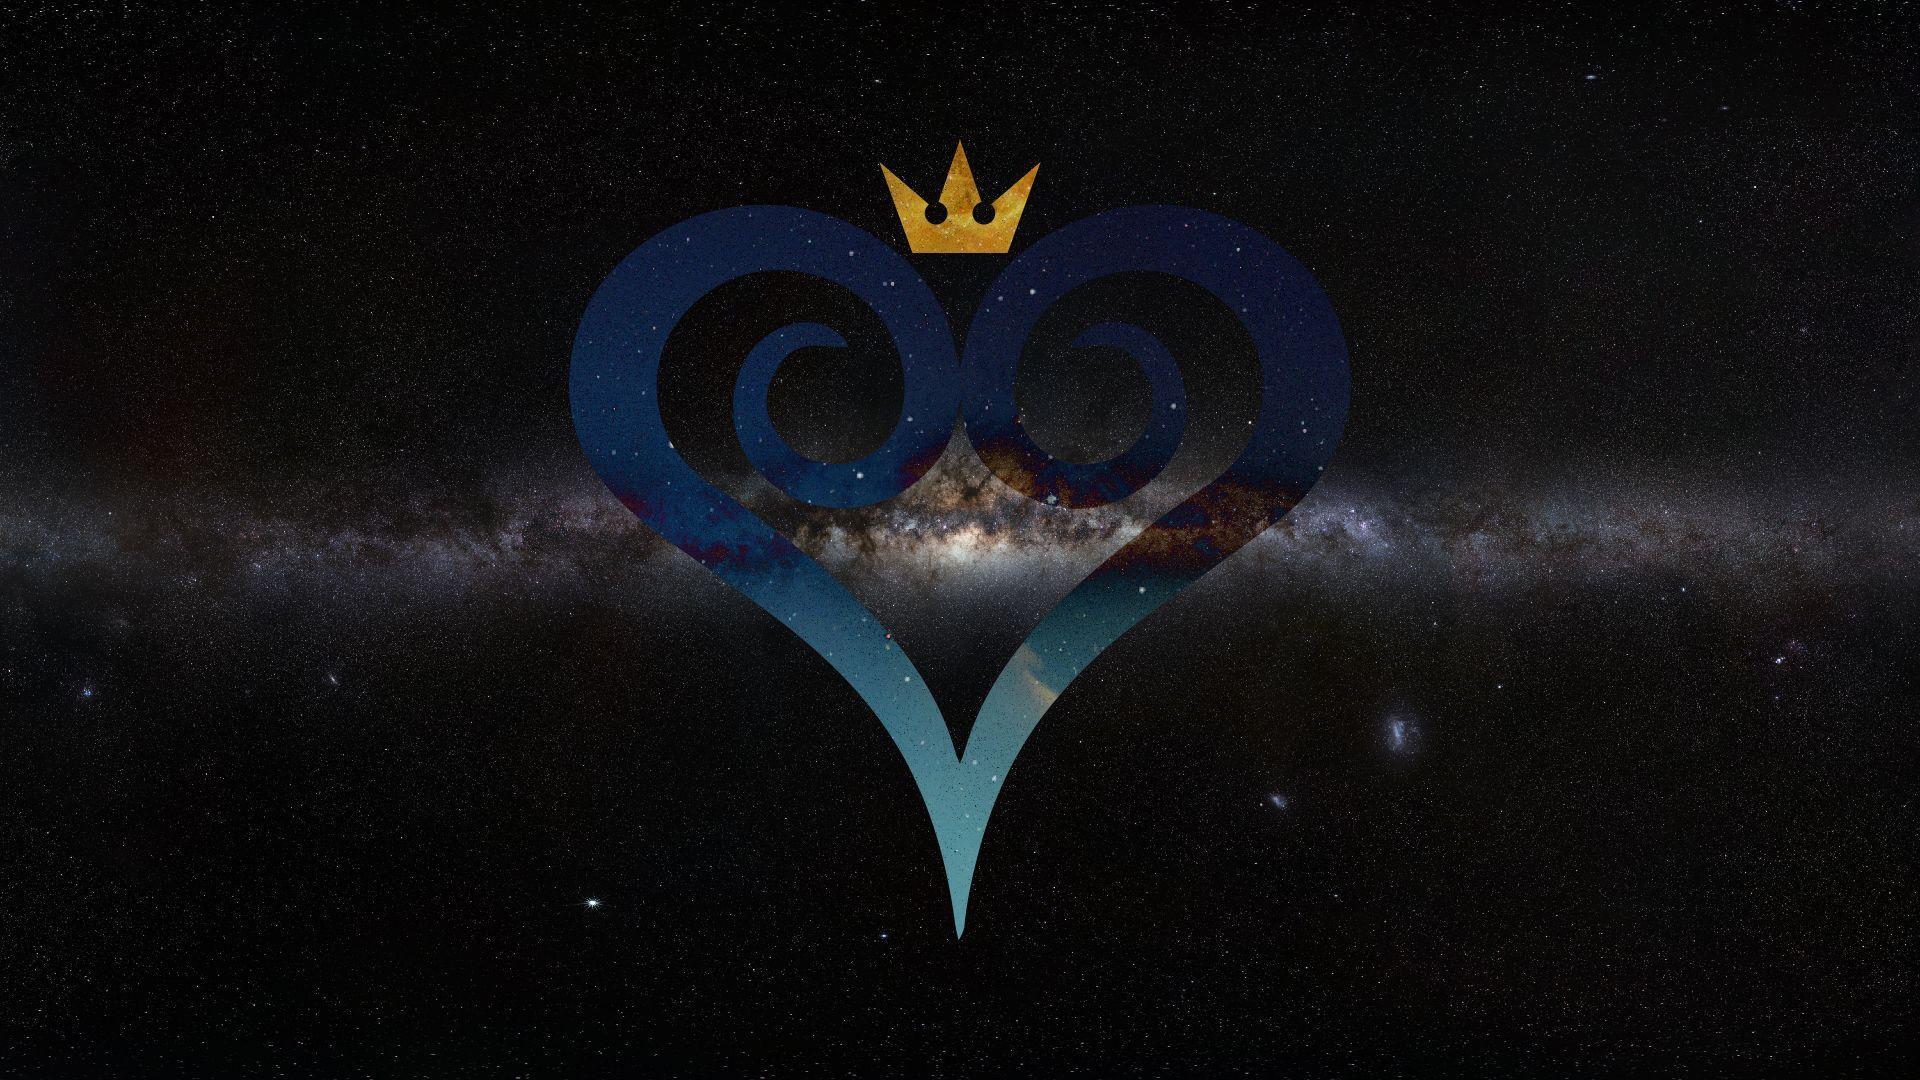 Kingdom Hearts 4K Wallpapers - Top Free Kingdom Hearts 4K ...